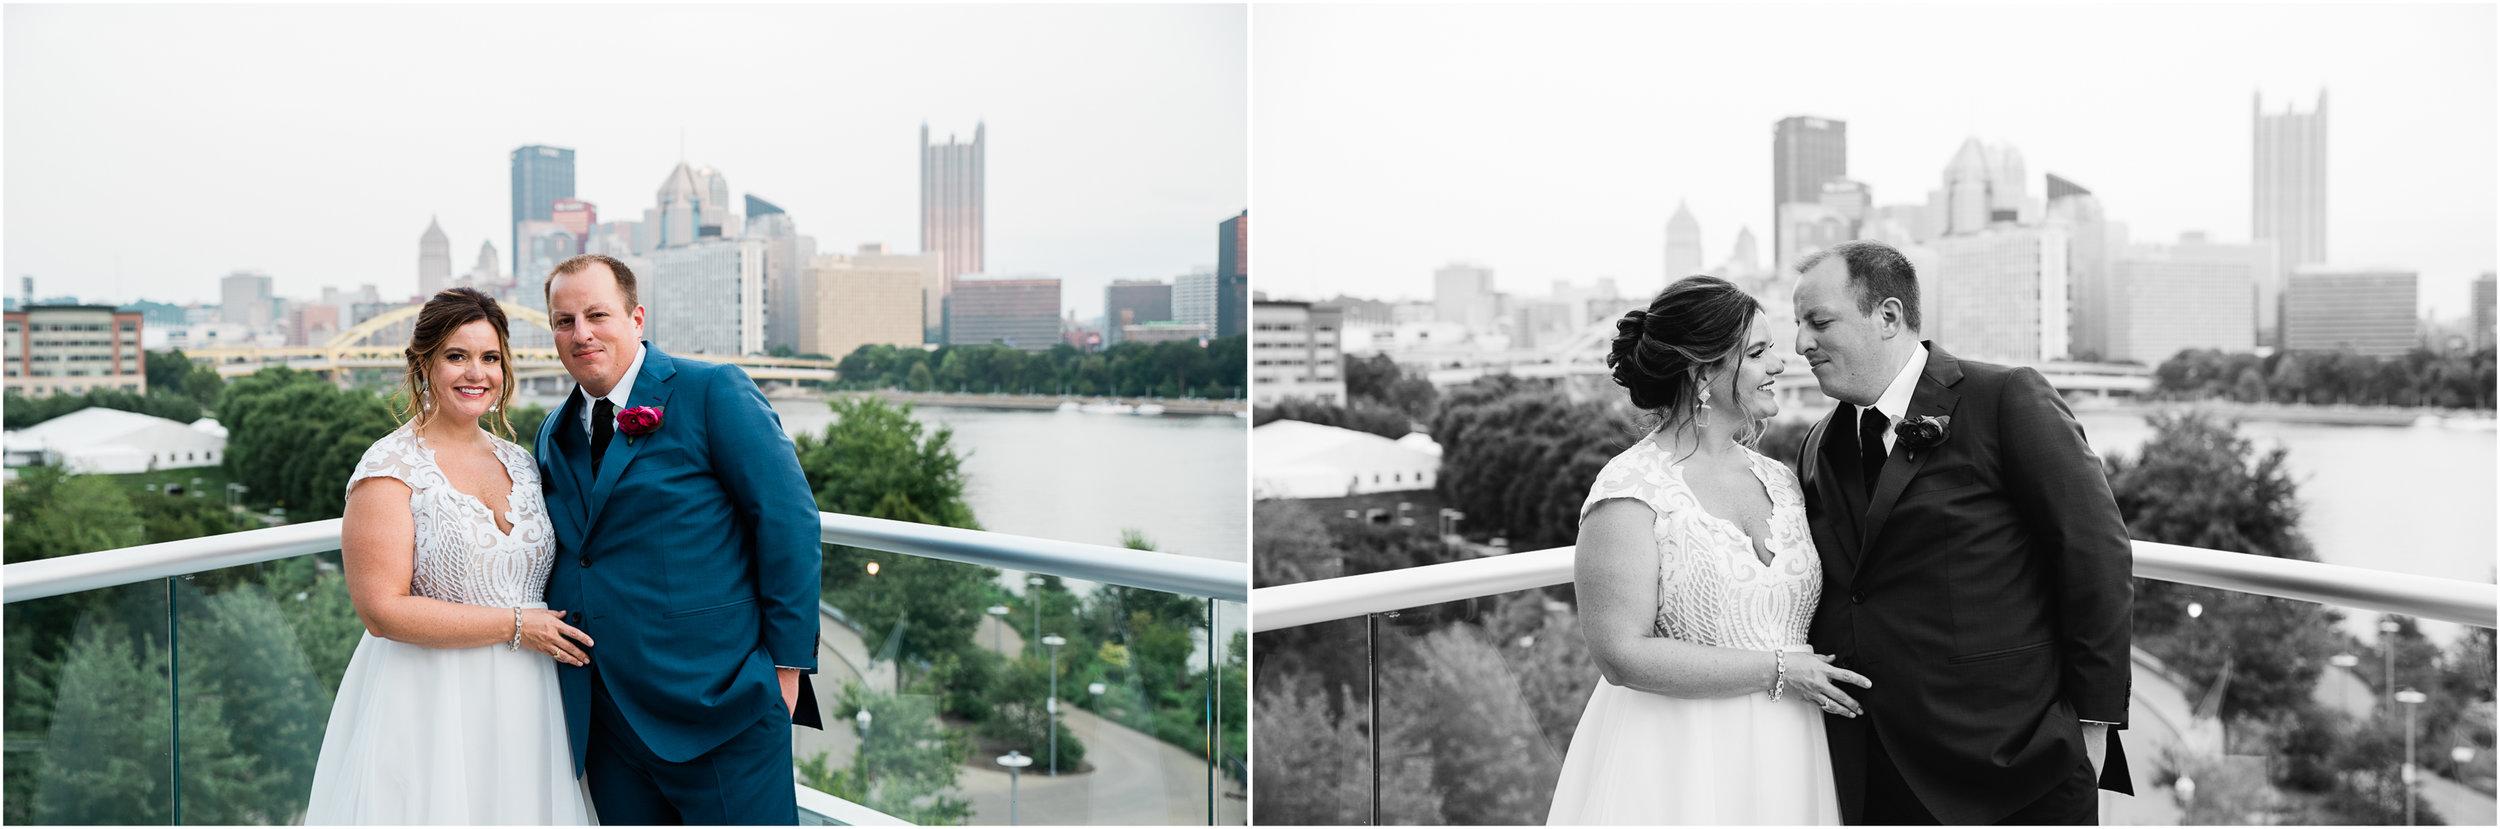 Pointview Hall Pittsburgh city wedding.jpg